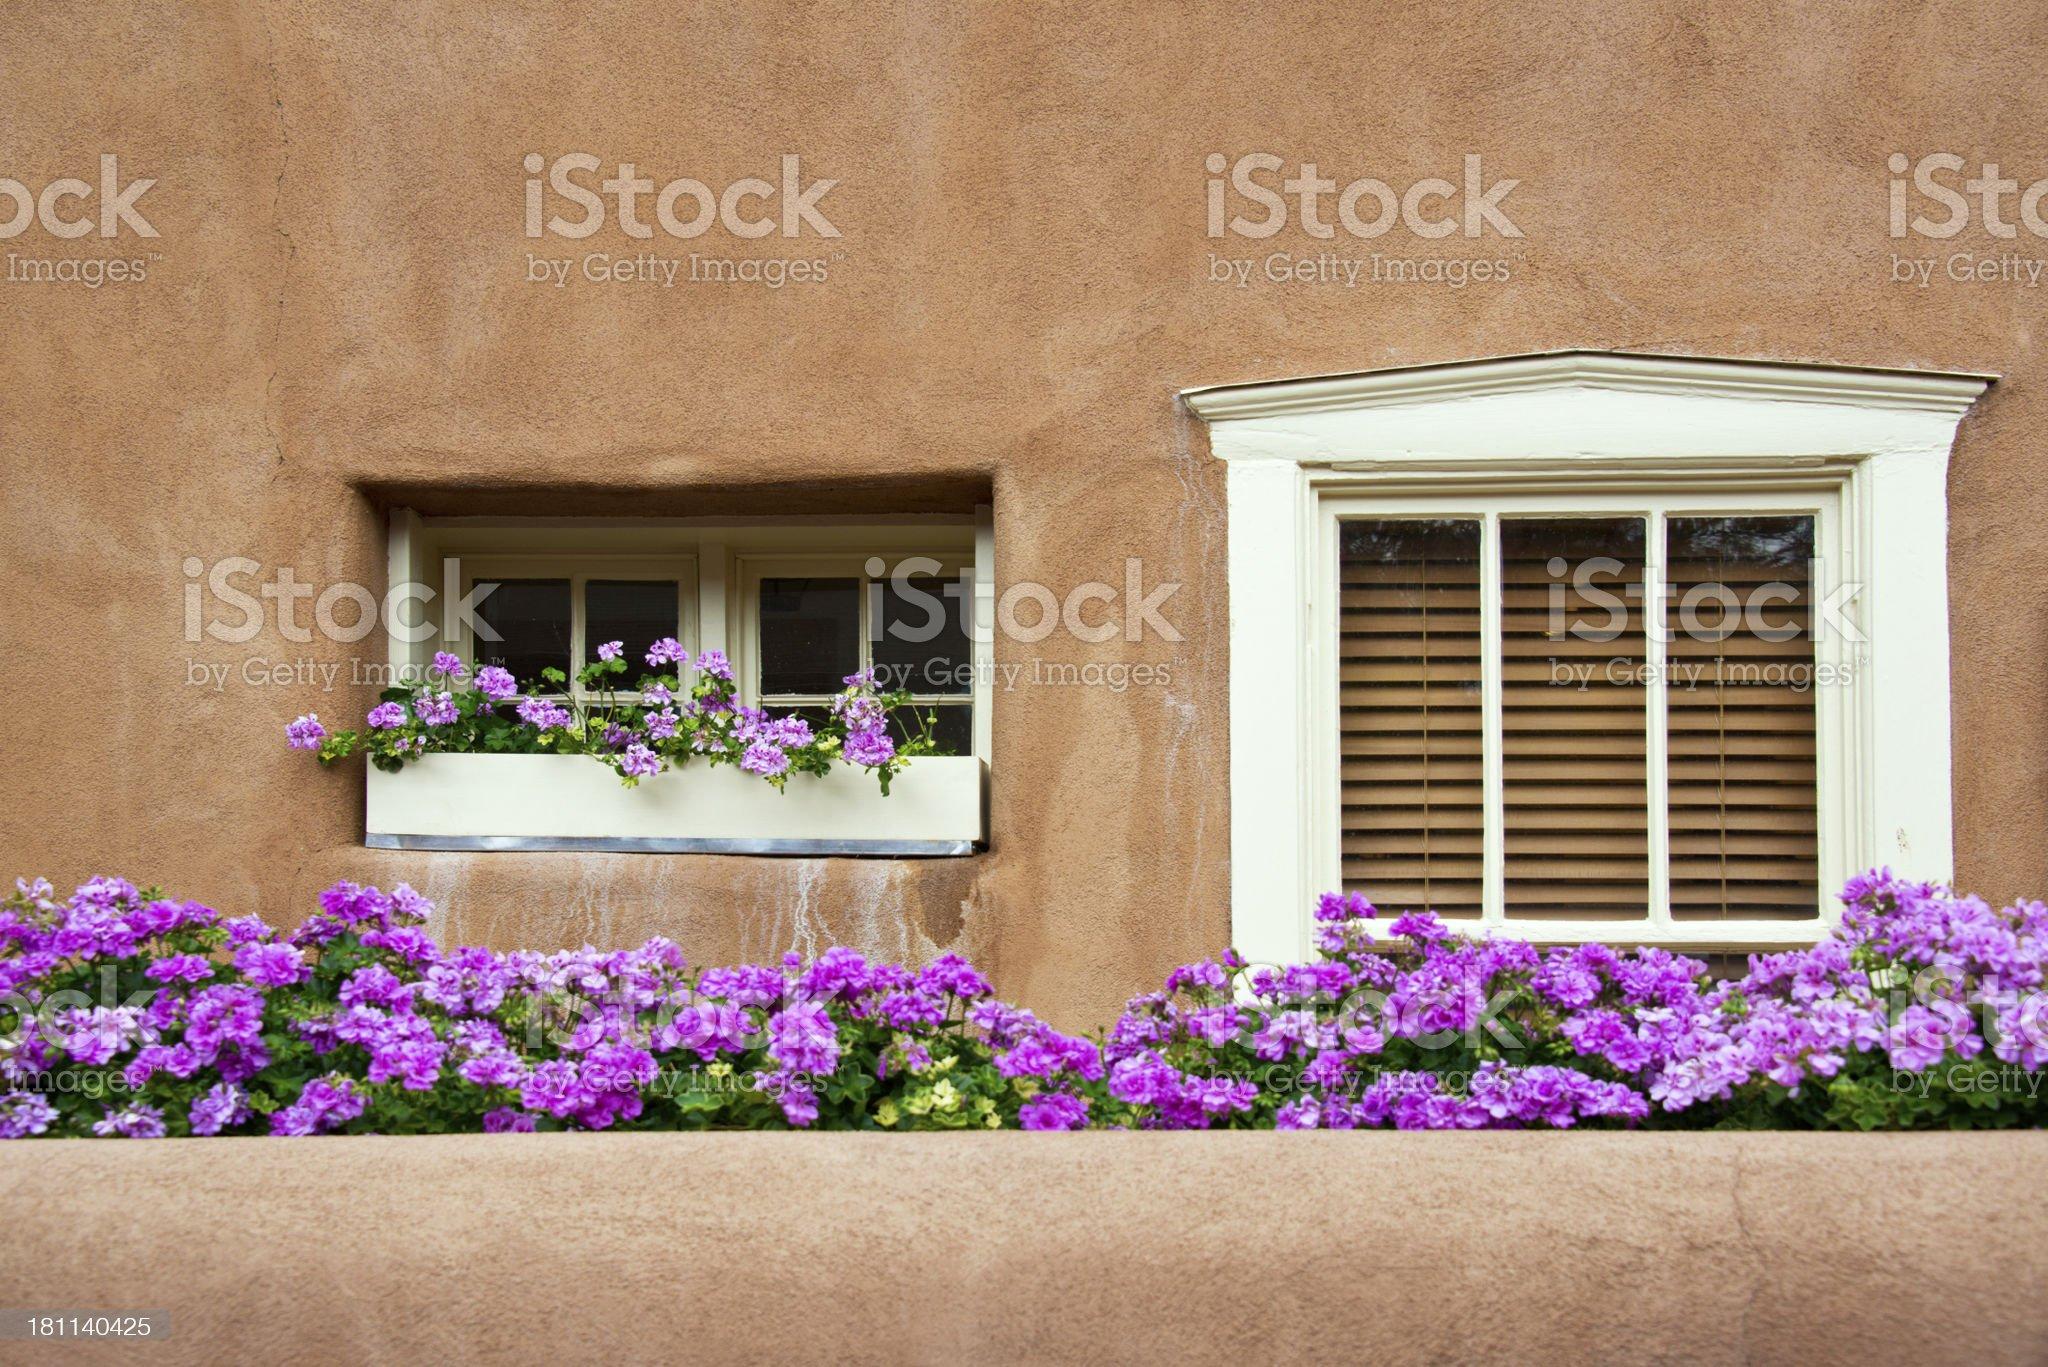 Windows on Southwest Santa Fe Adobe Stucco House royalty-free stock photo